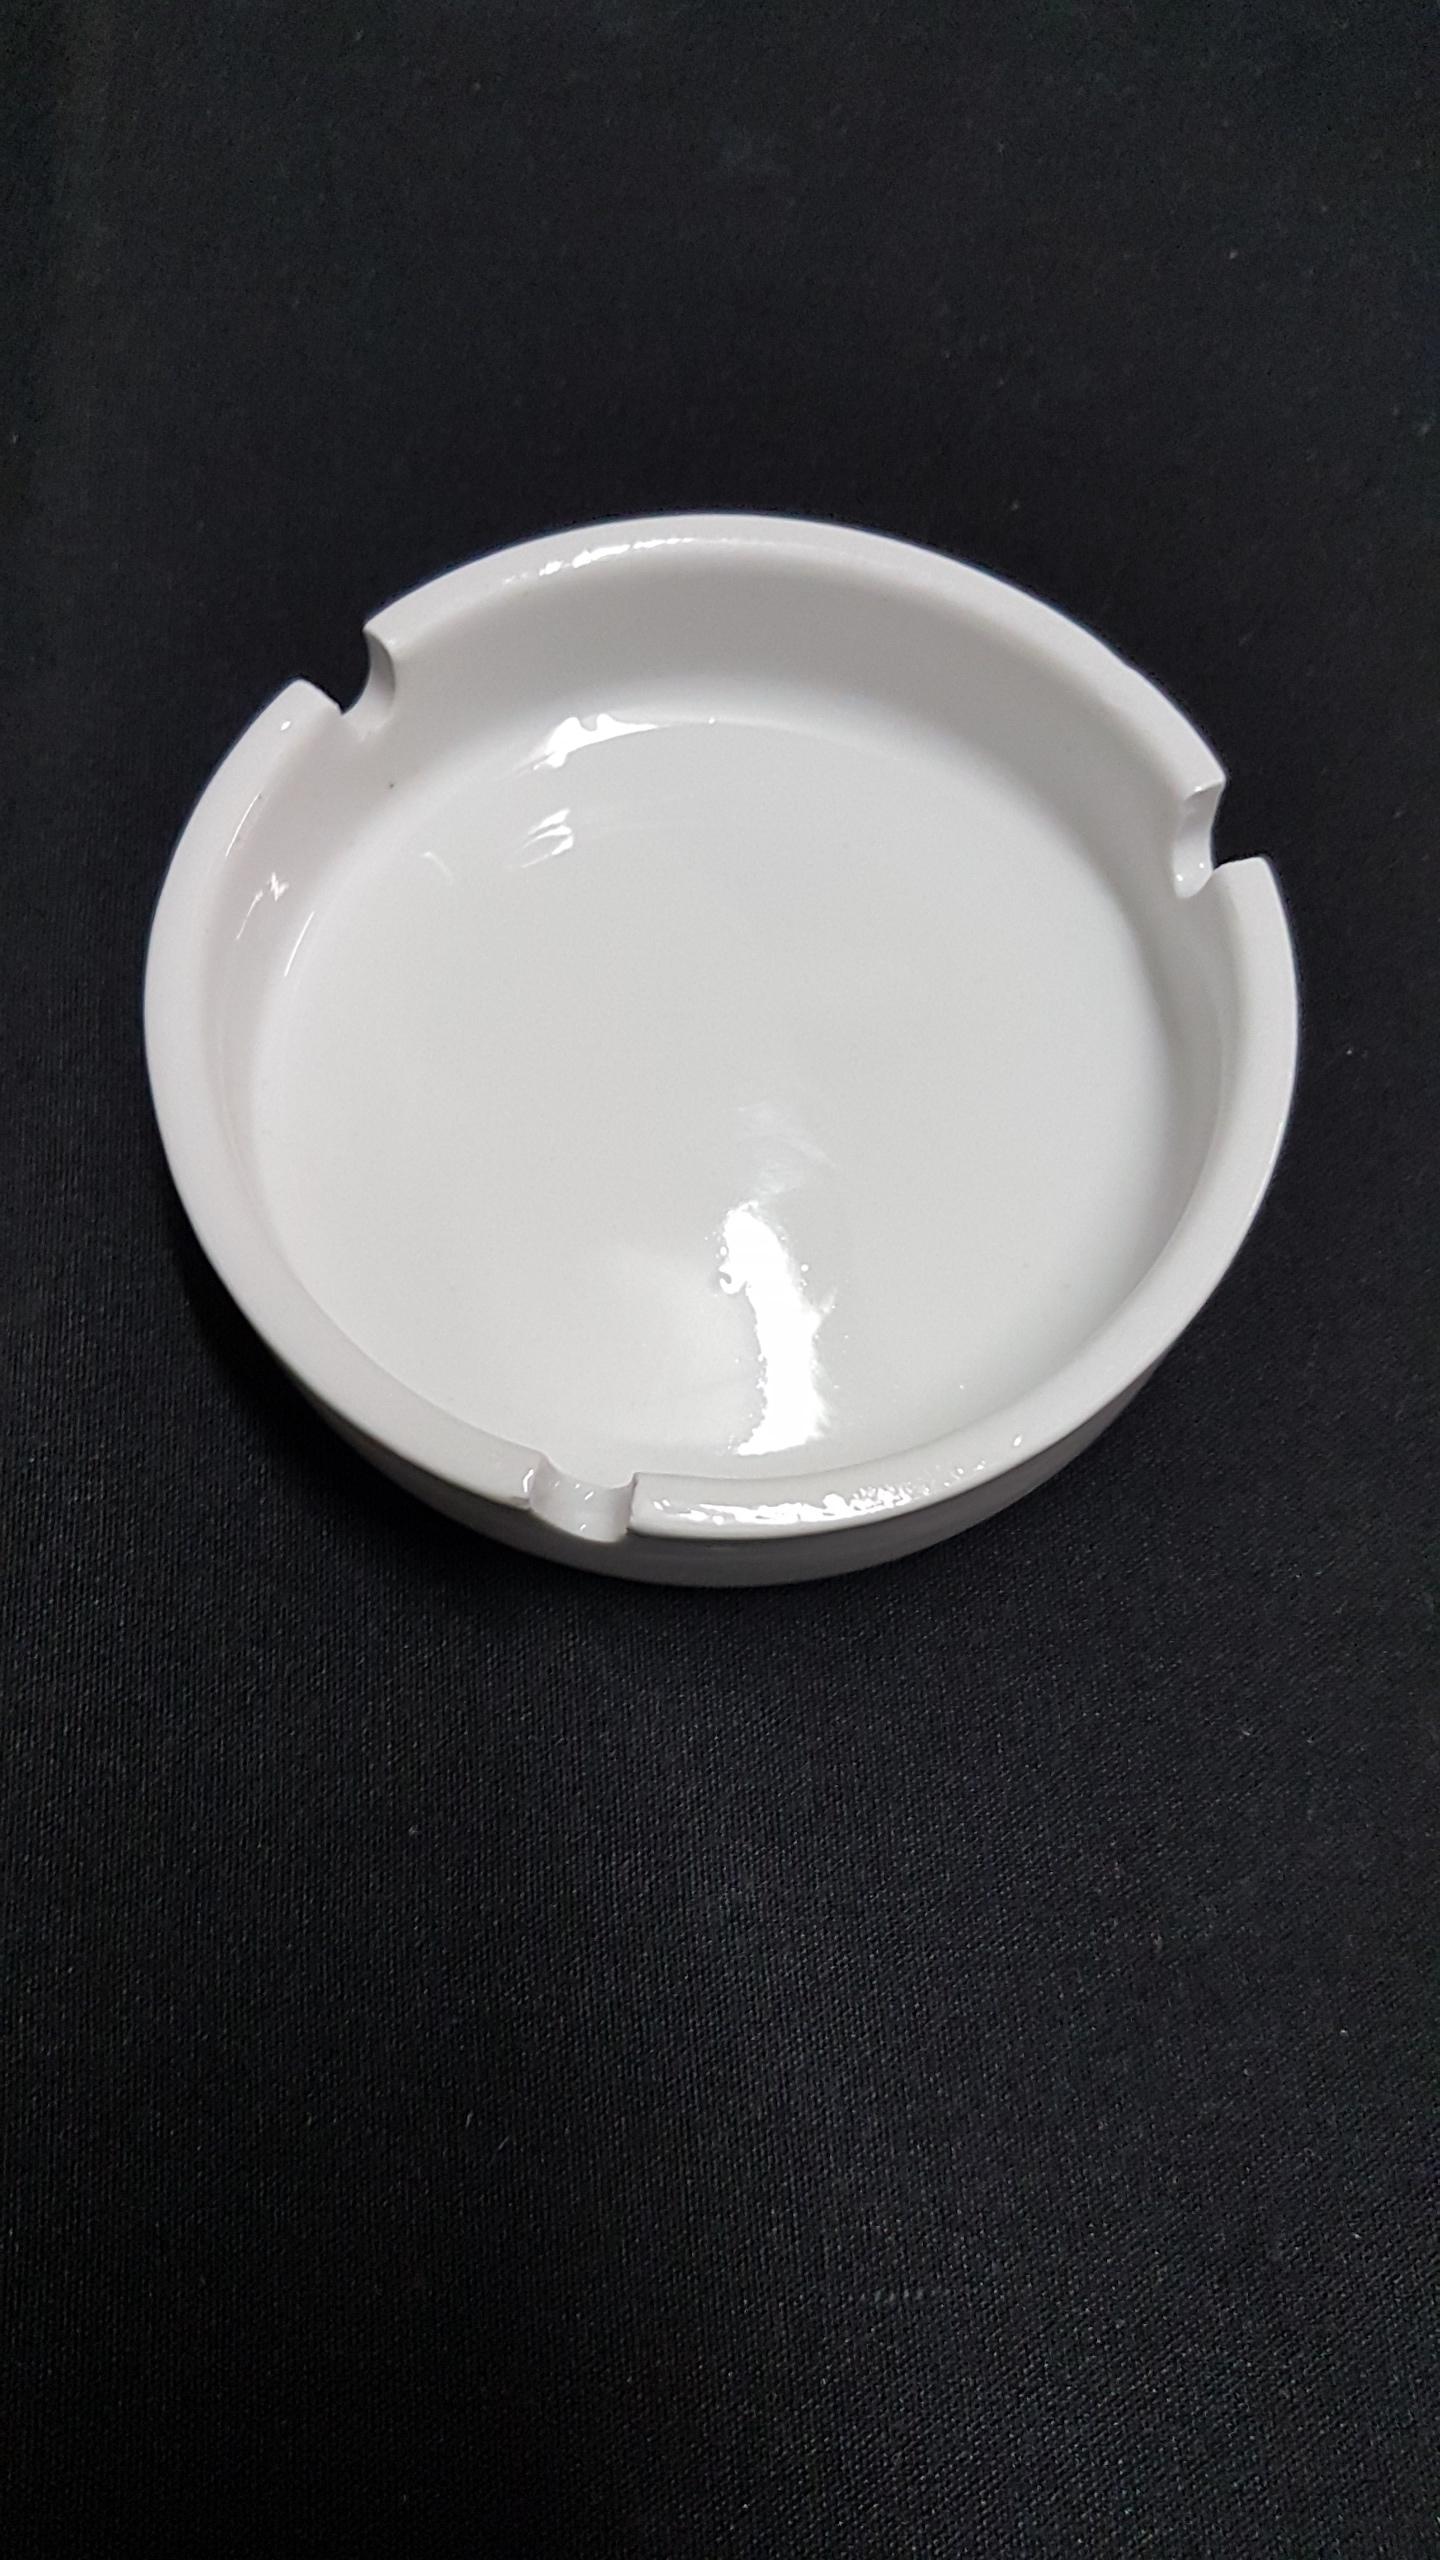 White China Ashtray $1.00ea